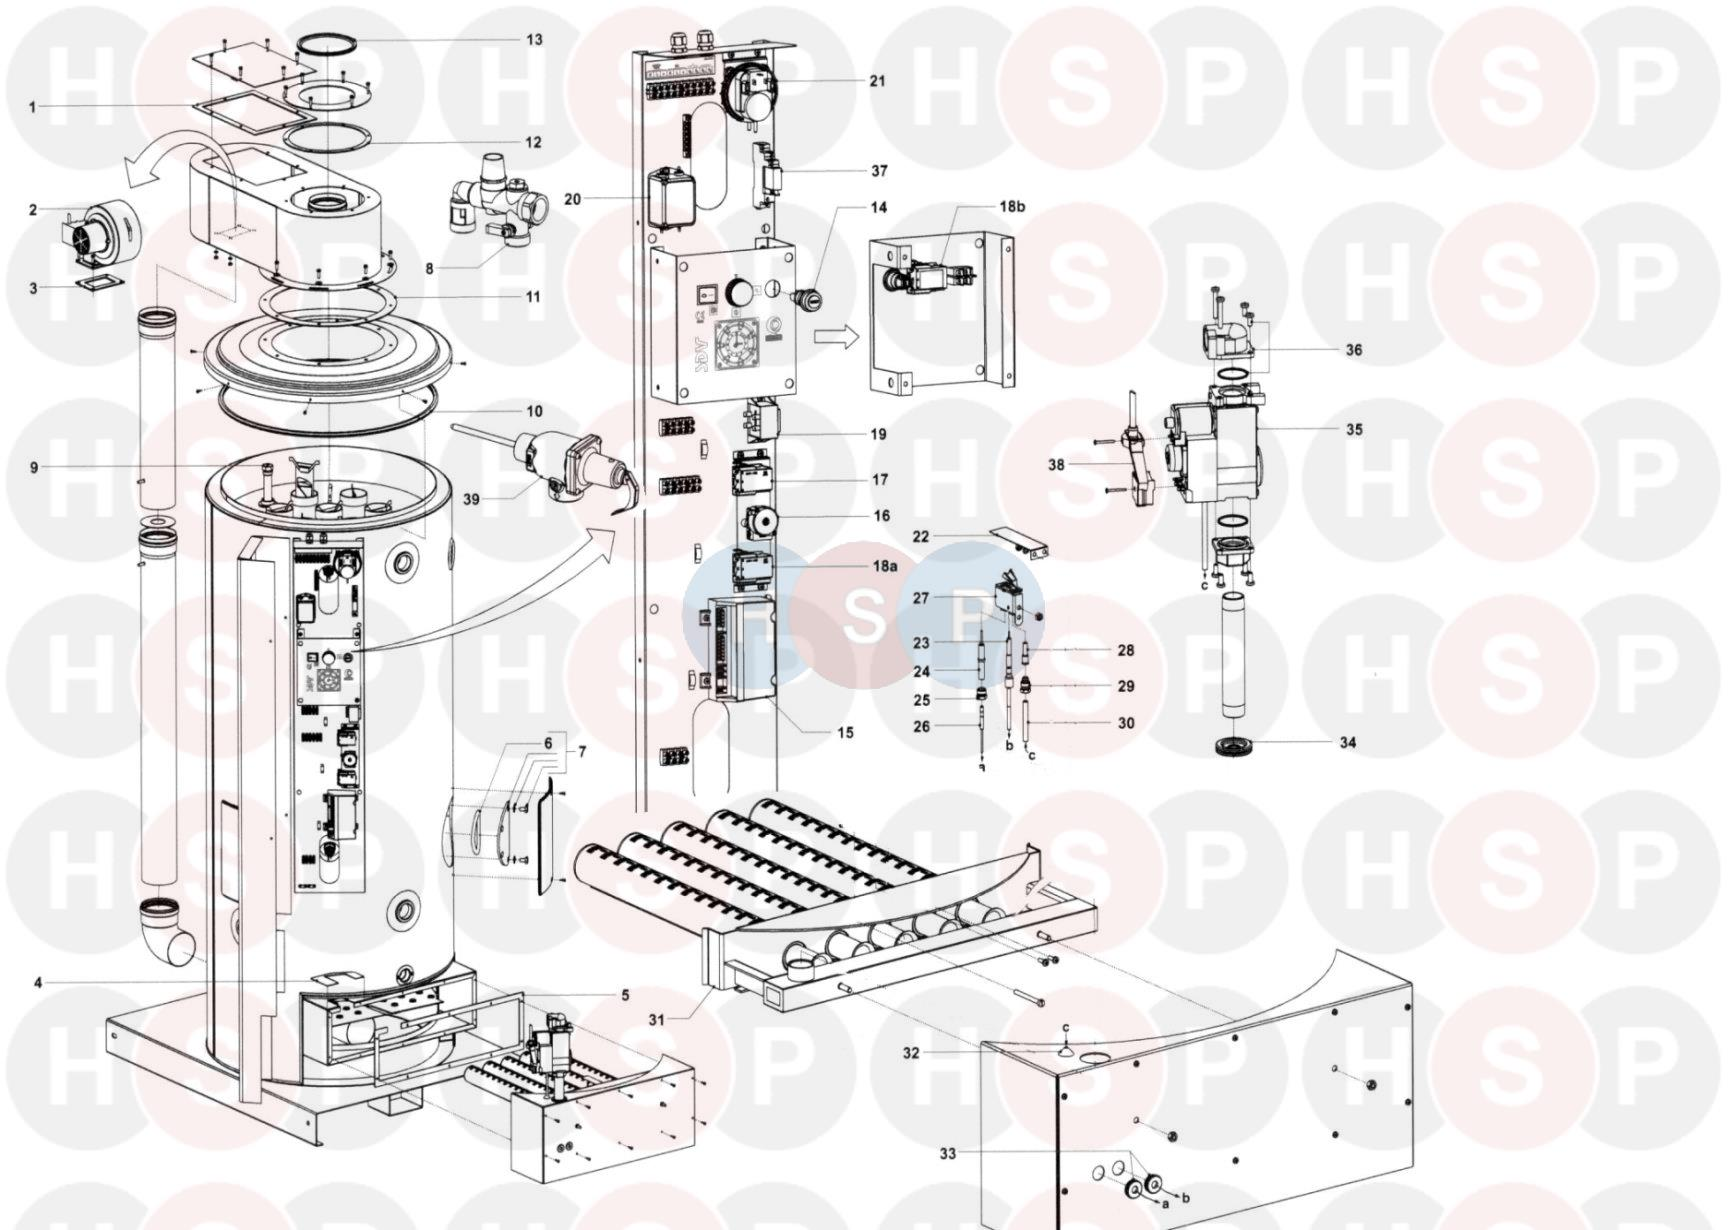 Johnson Starley STATE SDV70-260G (GAS APPLIANCE) Diagram